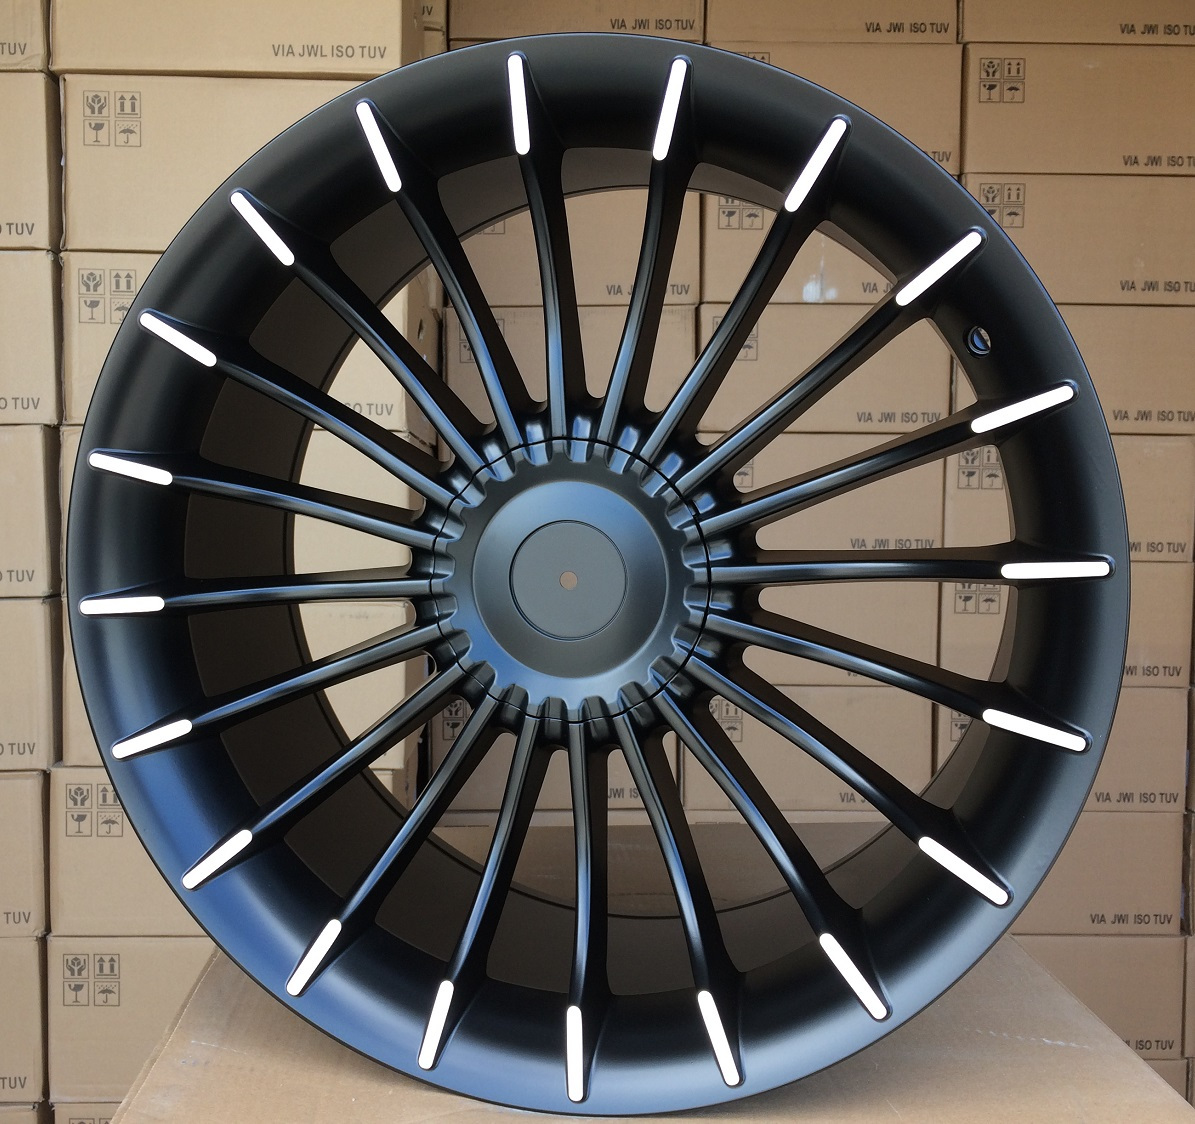 B18X9.5 5X120 ET20 74.1 BK273 MB half matt (Rear+Front) RWR Style Alpina (P)## 9.5x18 ET18 5x120